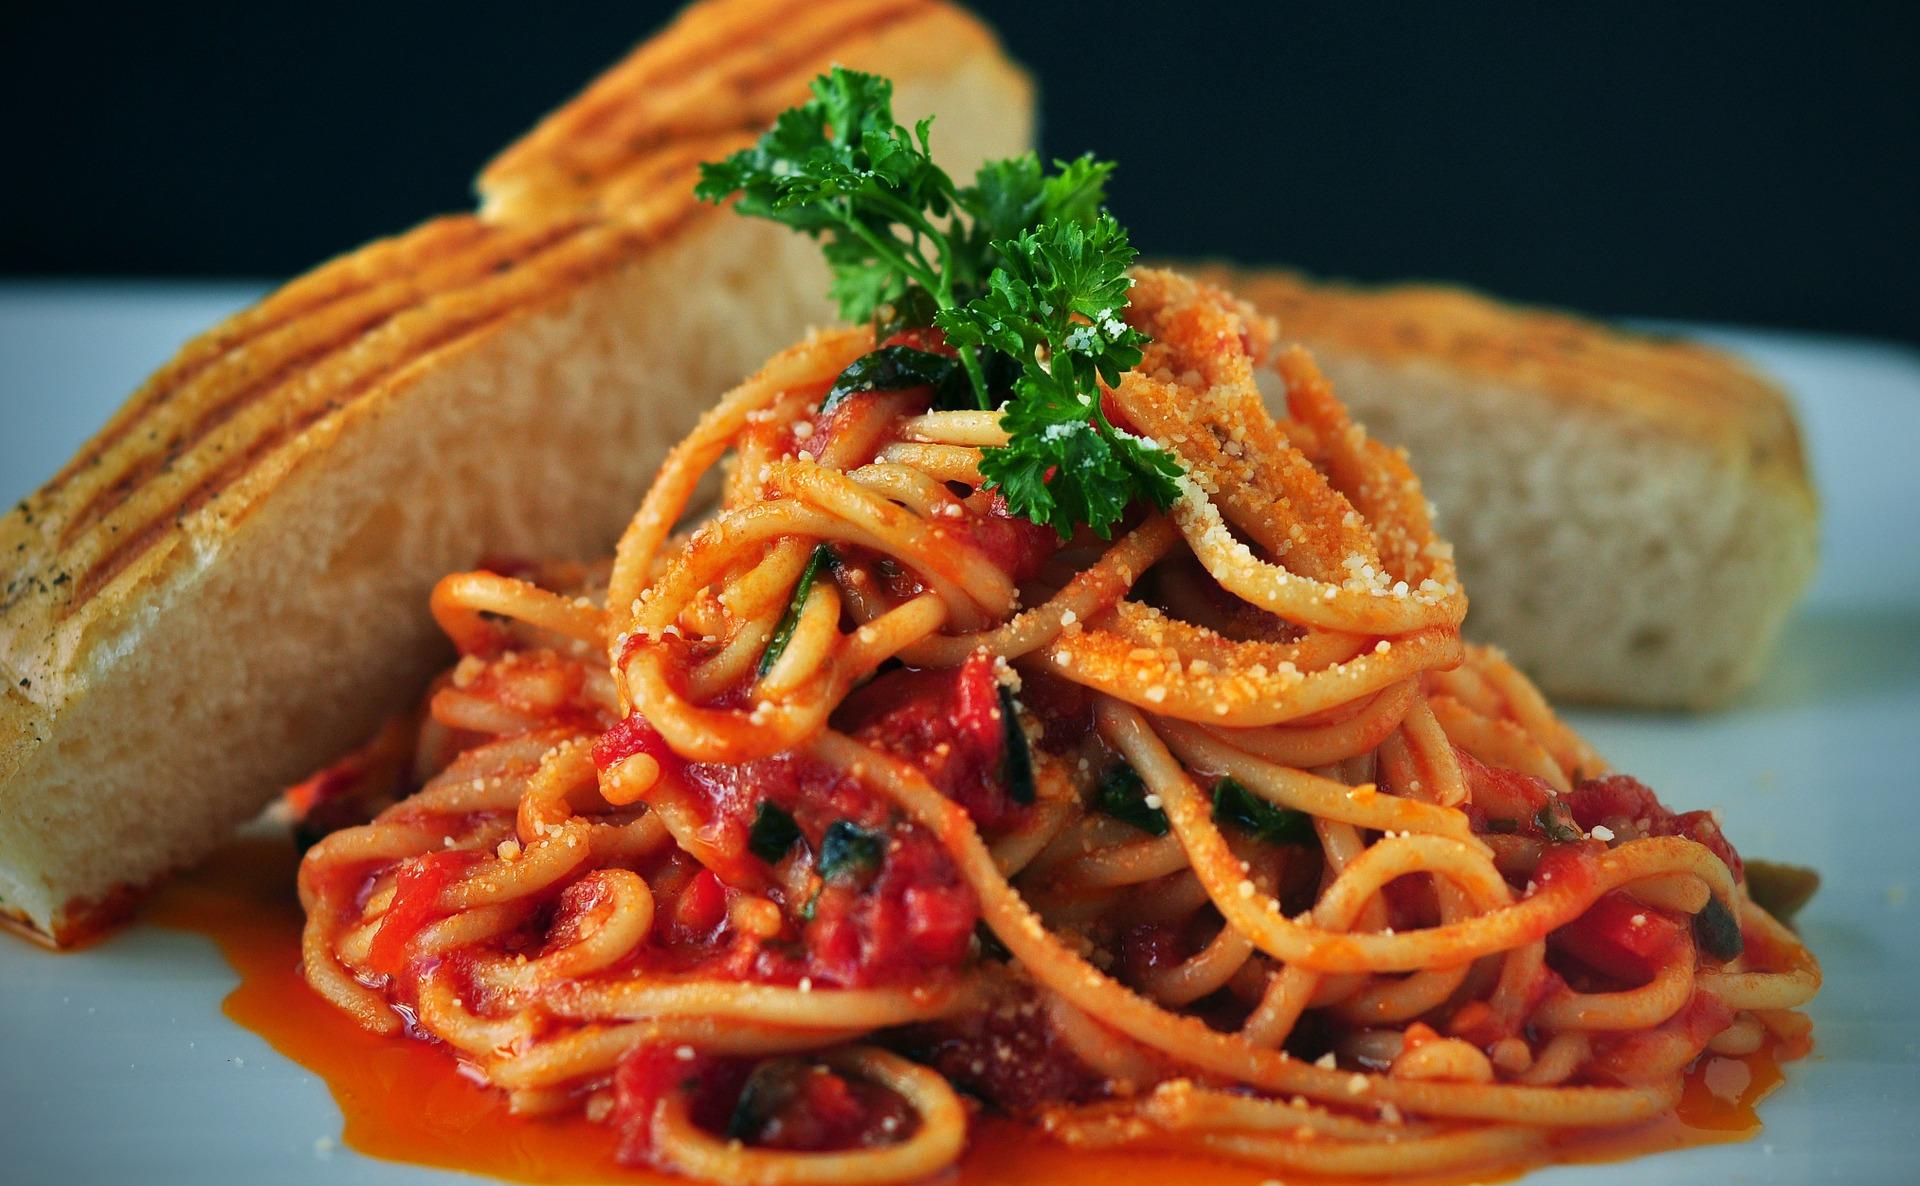 Spaghetti and tomato sauce, an iconic Italian recipe | joshuemd/pixabay